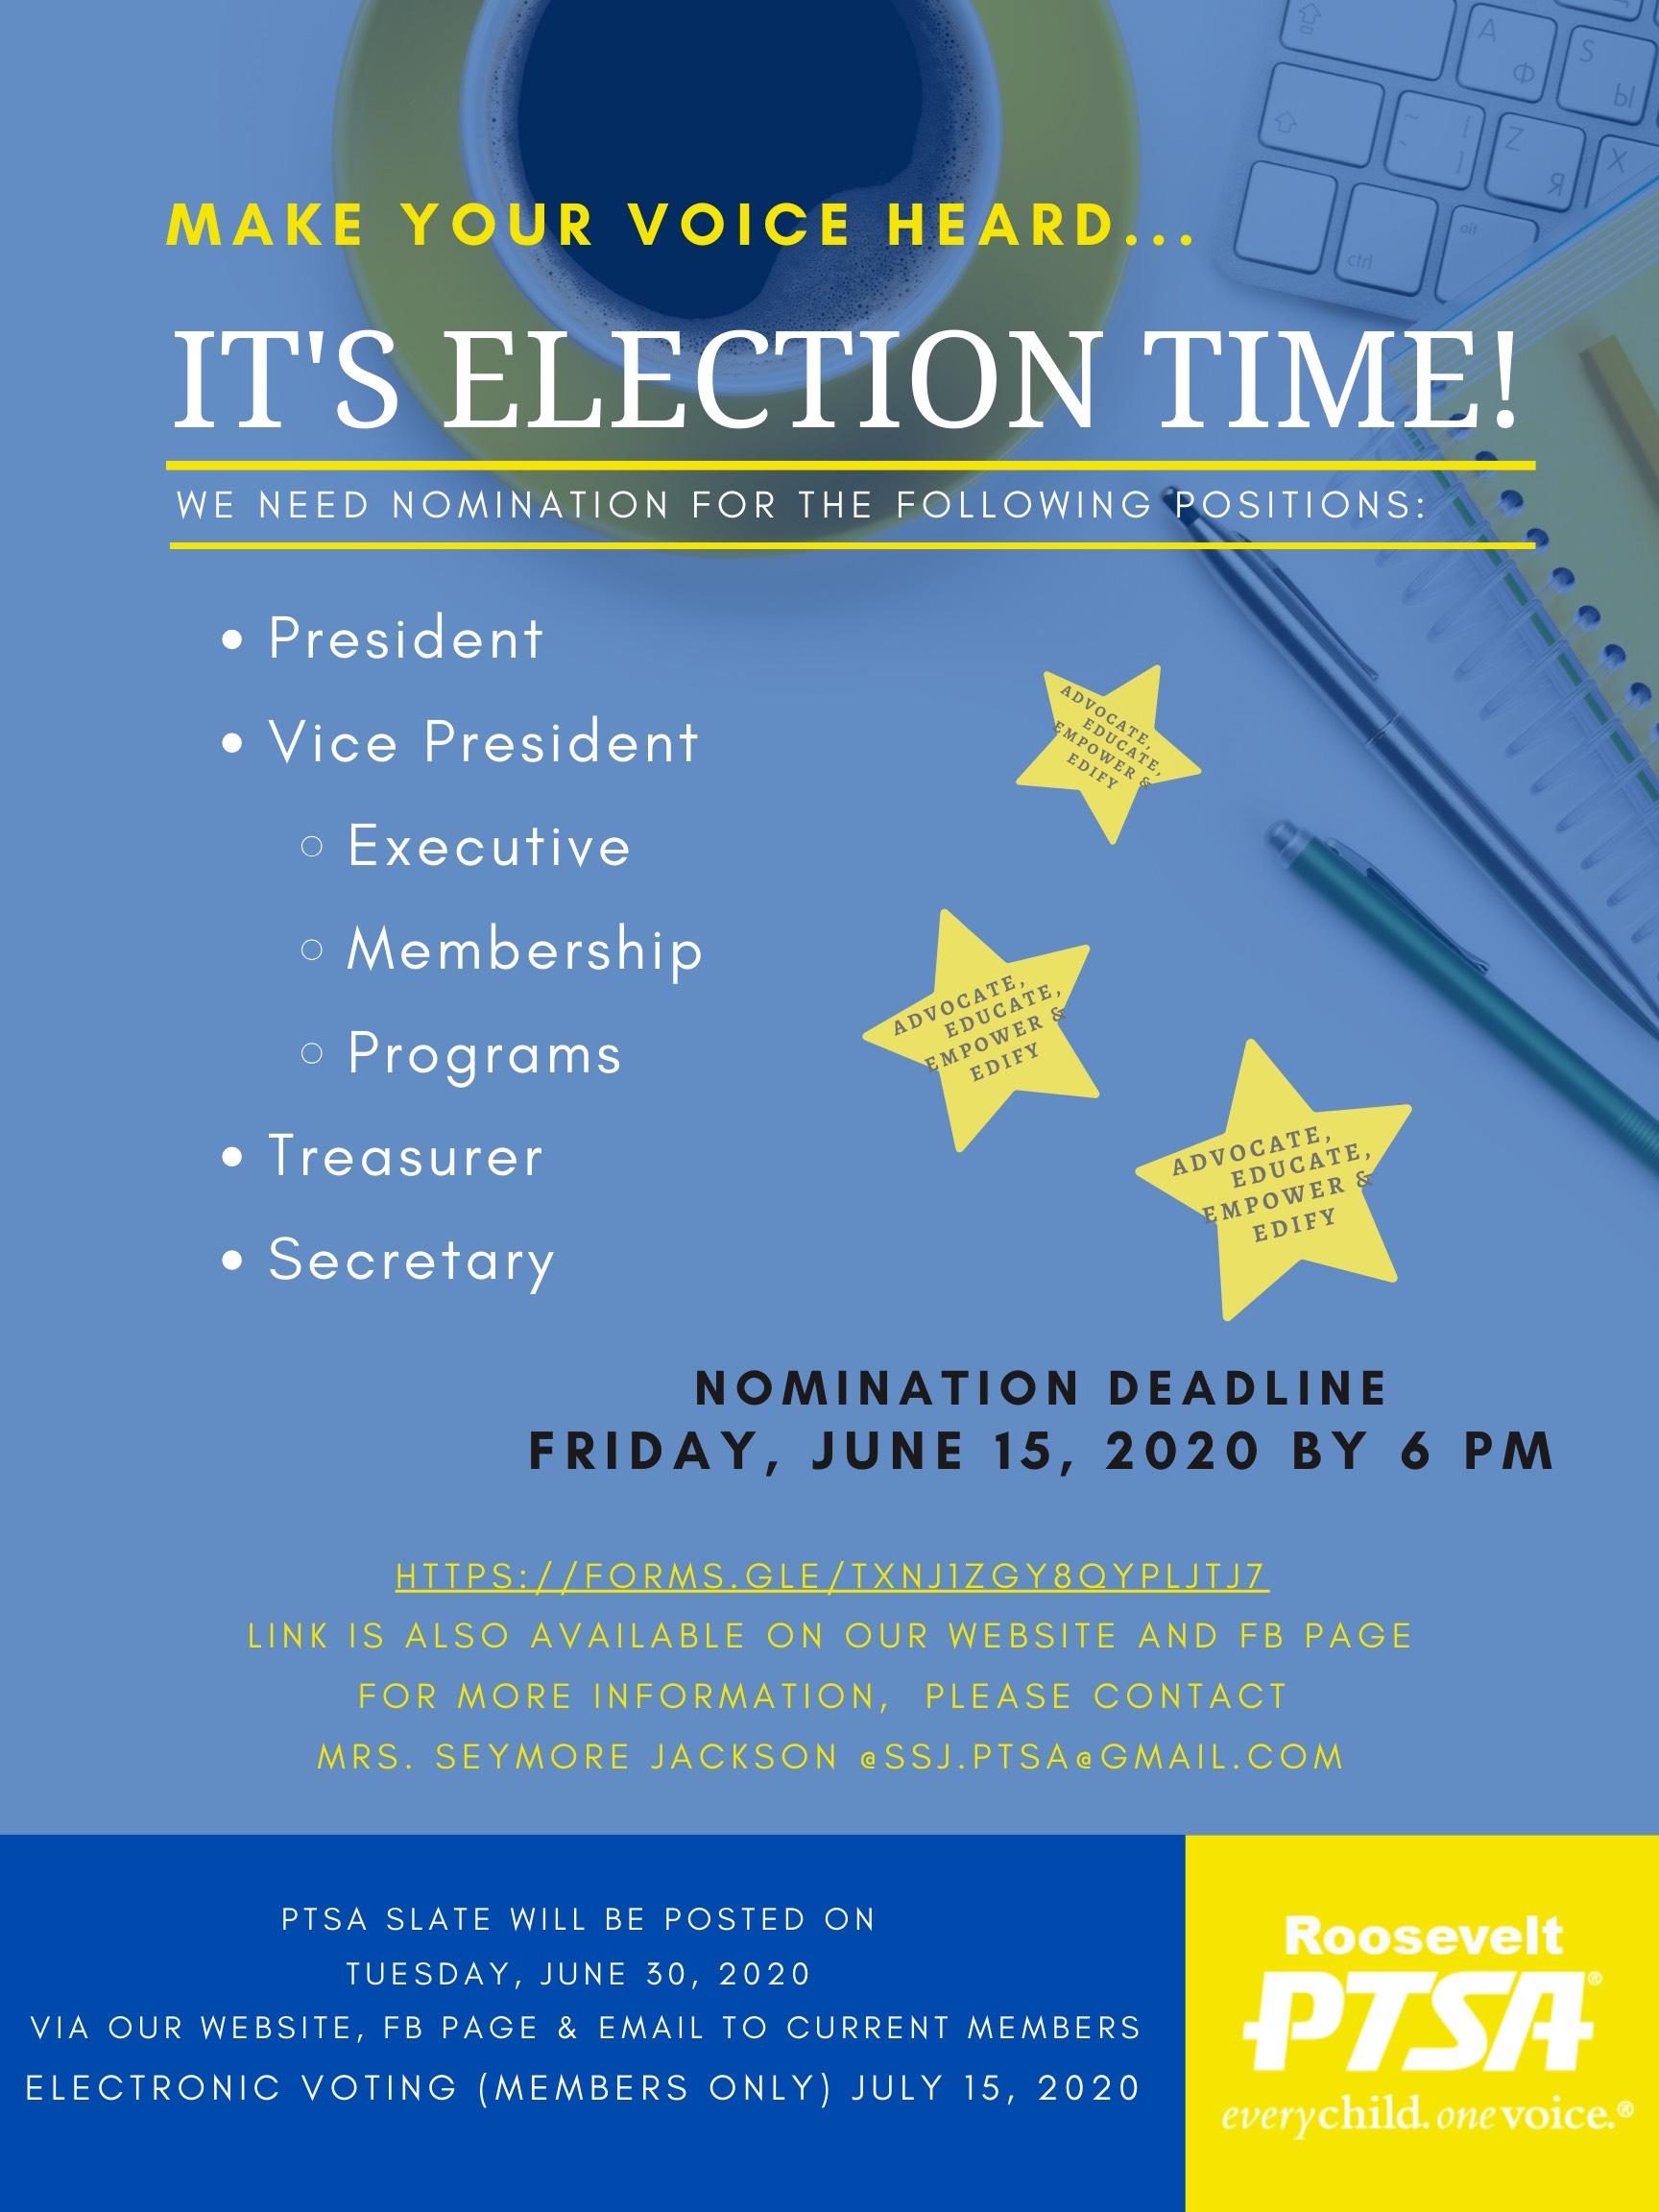 PTSA Election Time